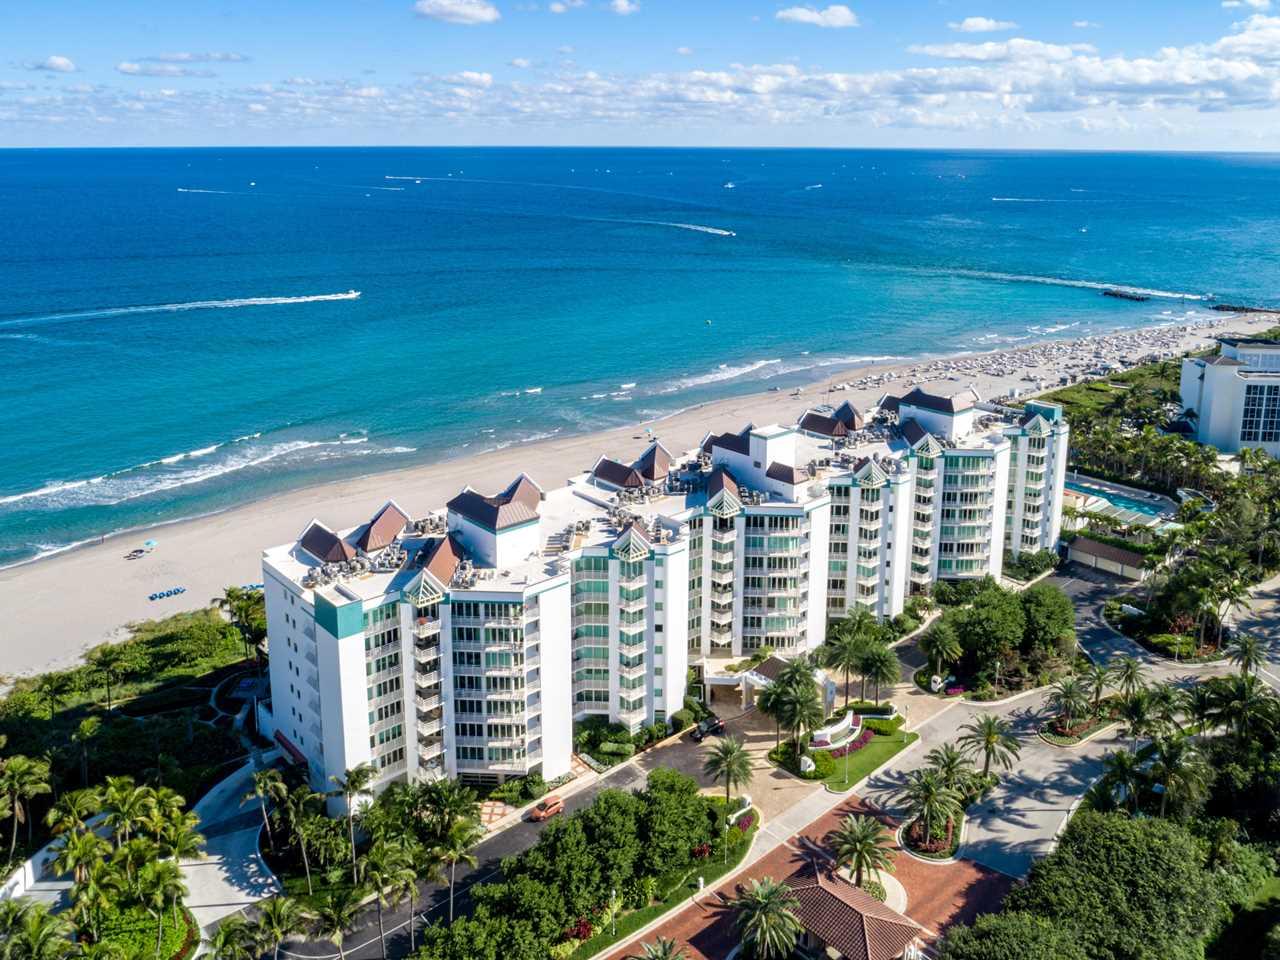 800 S Ocean Boulevard #305 Boca Raton, FL 33432 | RX-10495028 - BocaLuxuryCondos.com Photo 1